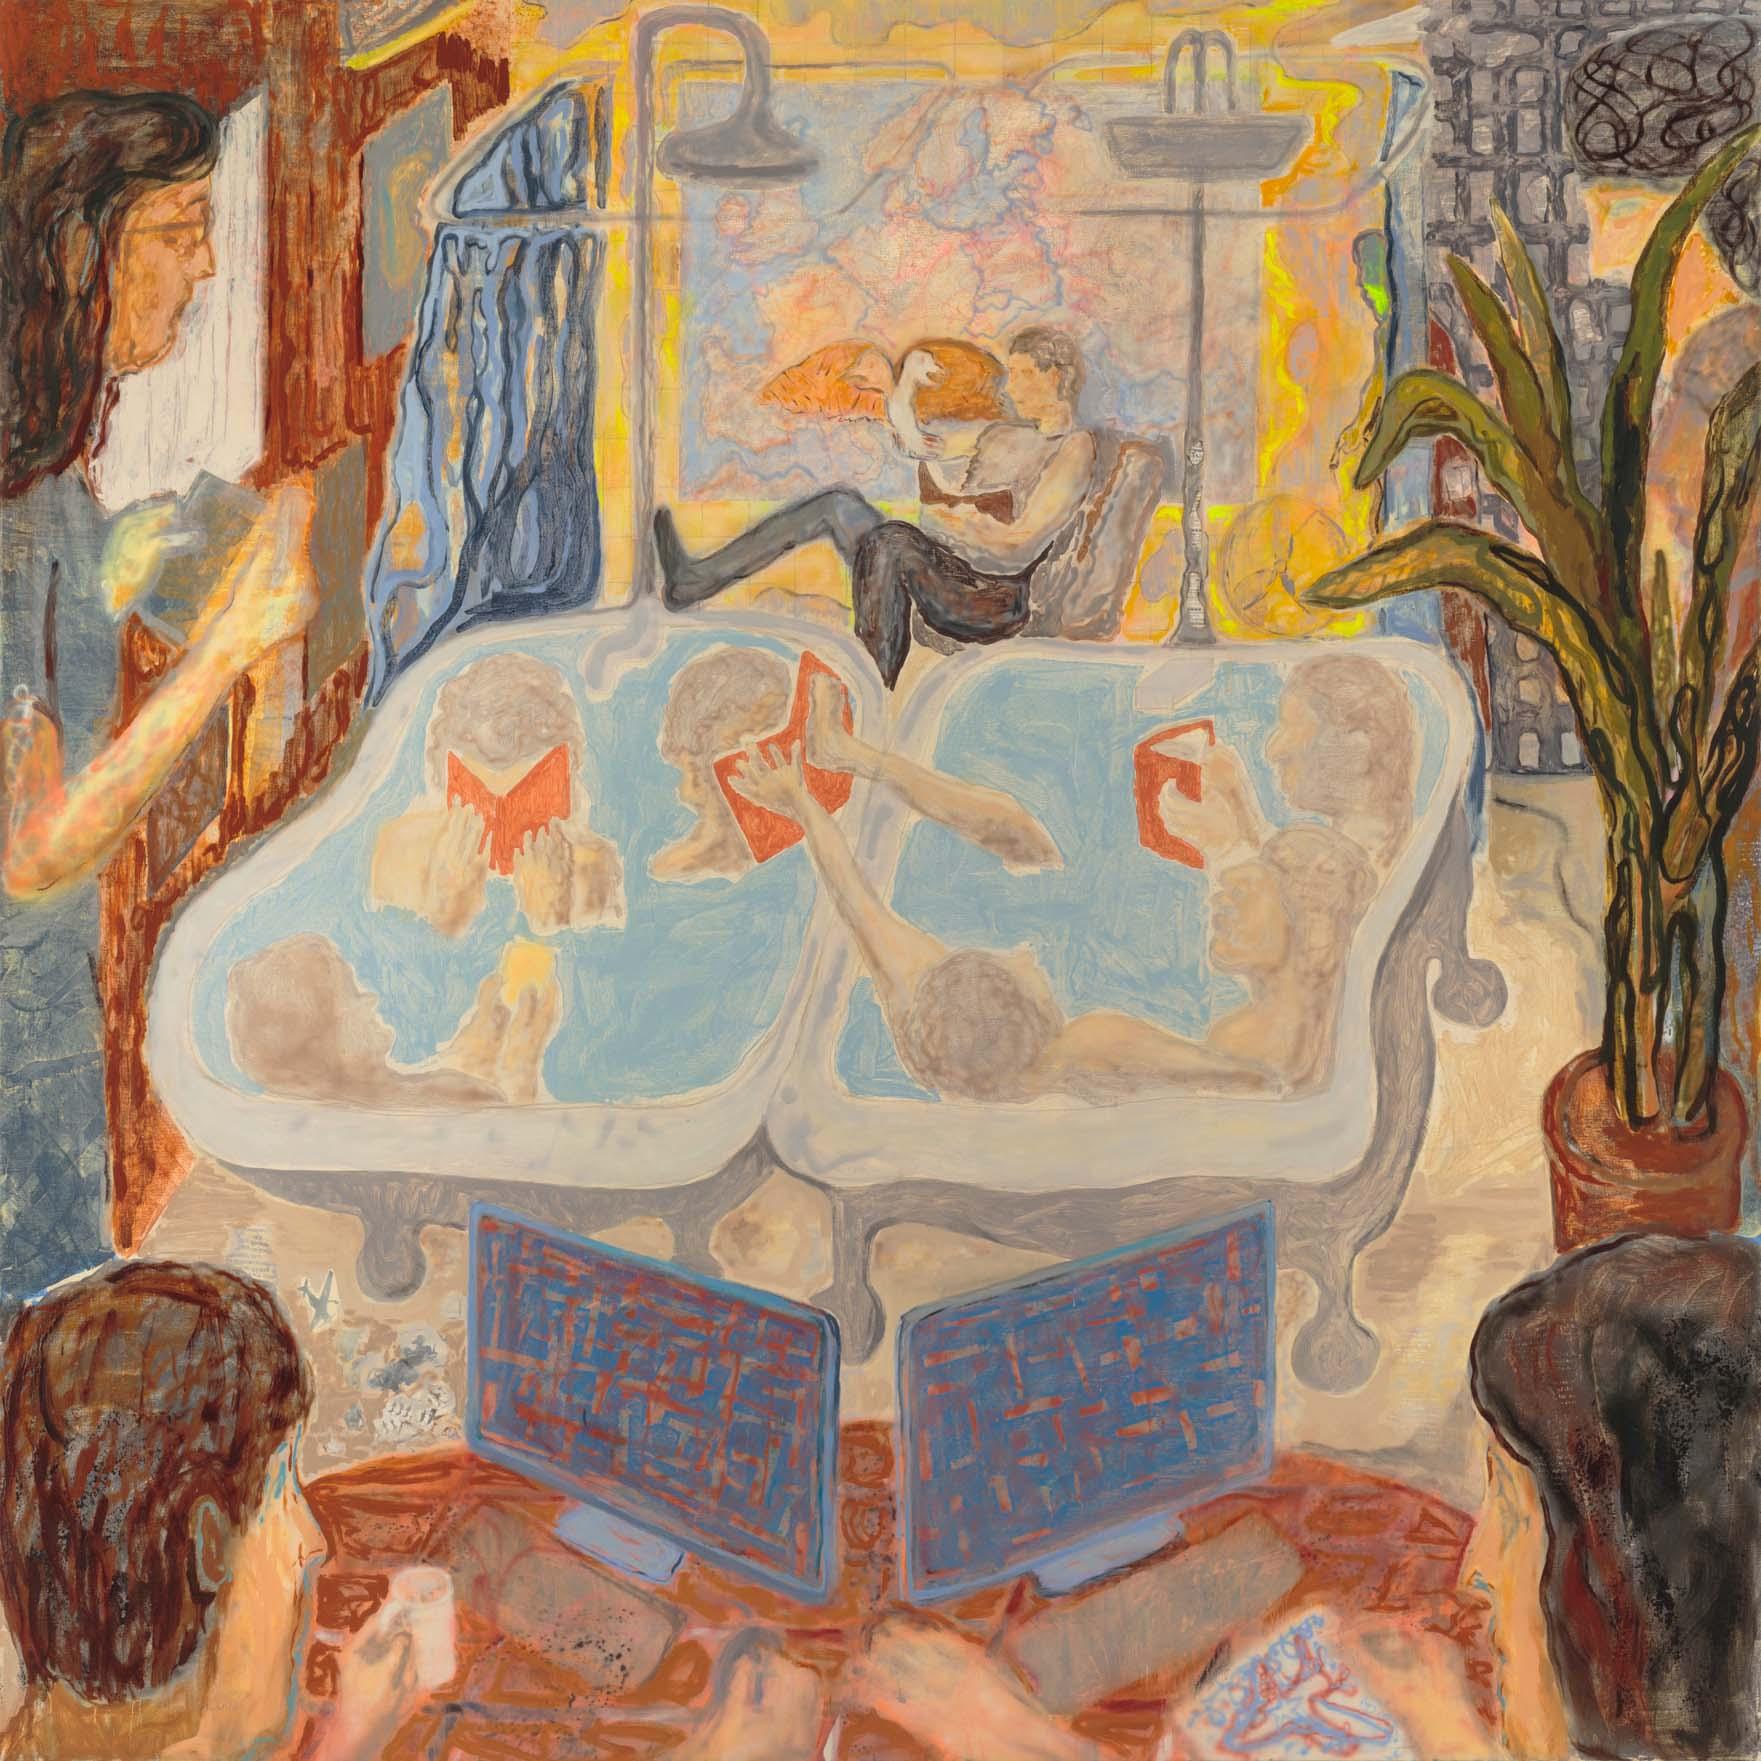 "Bathtub Hebrew School, 72"" x 72"", Oil, Screenprint,  Acrylic, and Airbrush on Canvas, 2017."